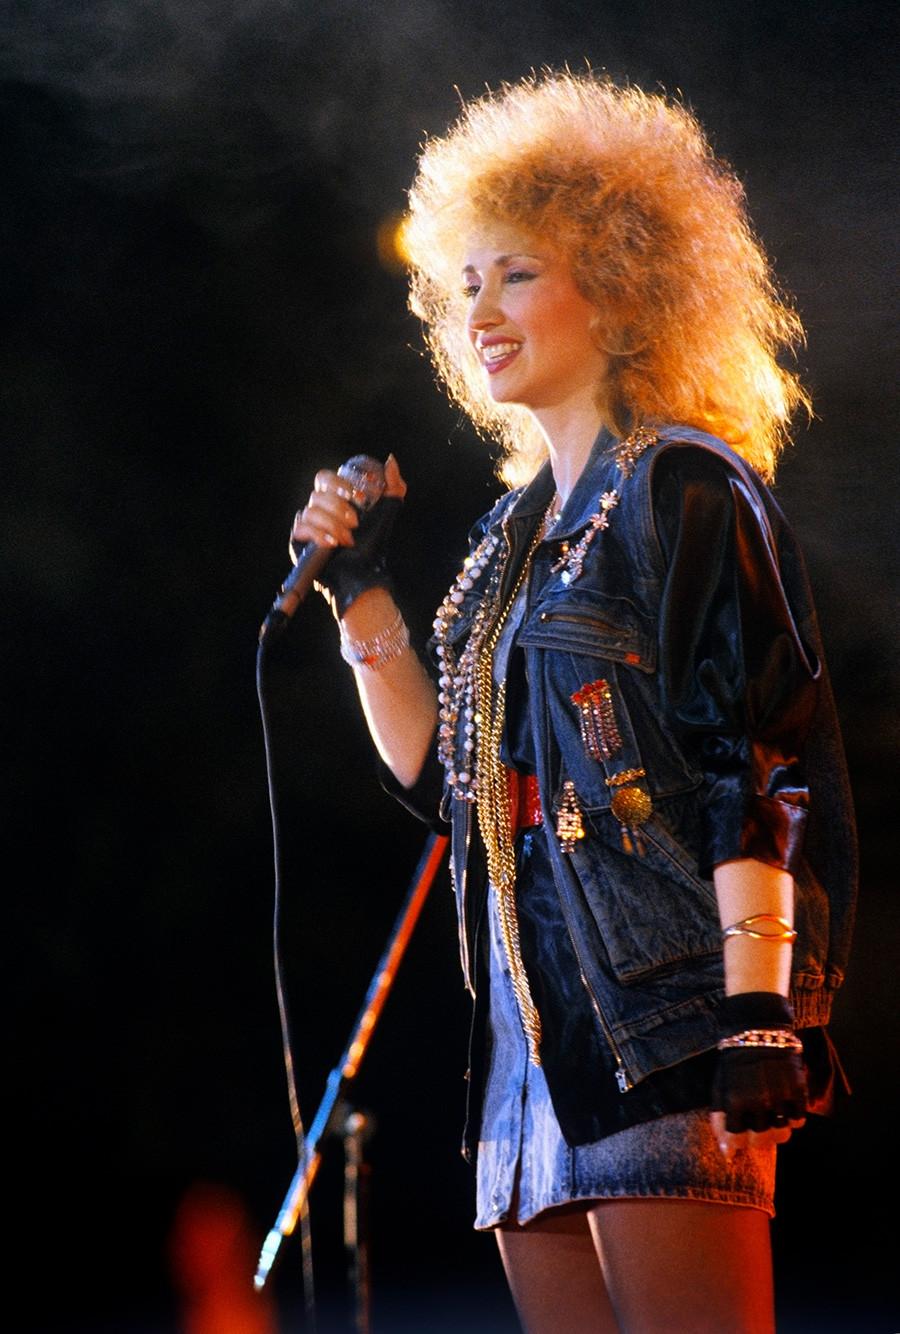 La chanteuse Irina Allegrova